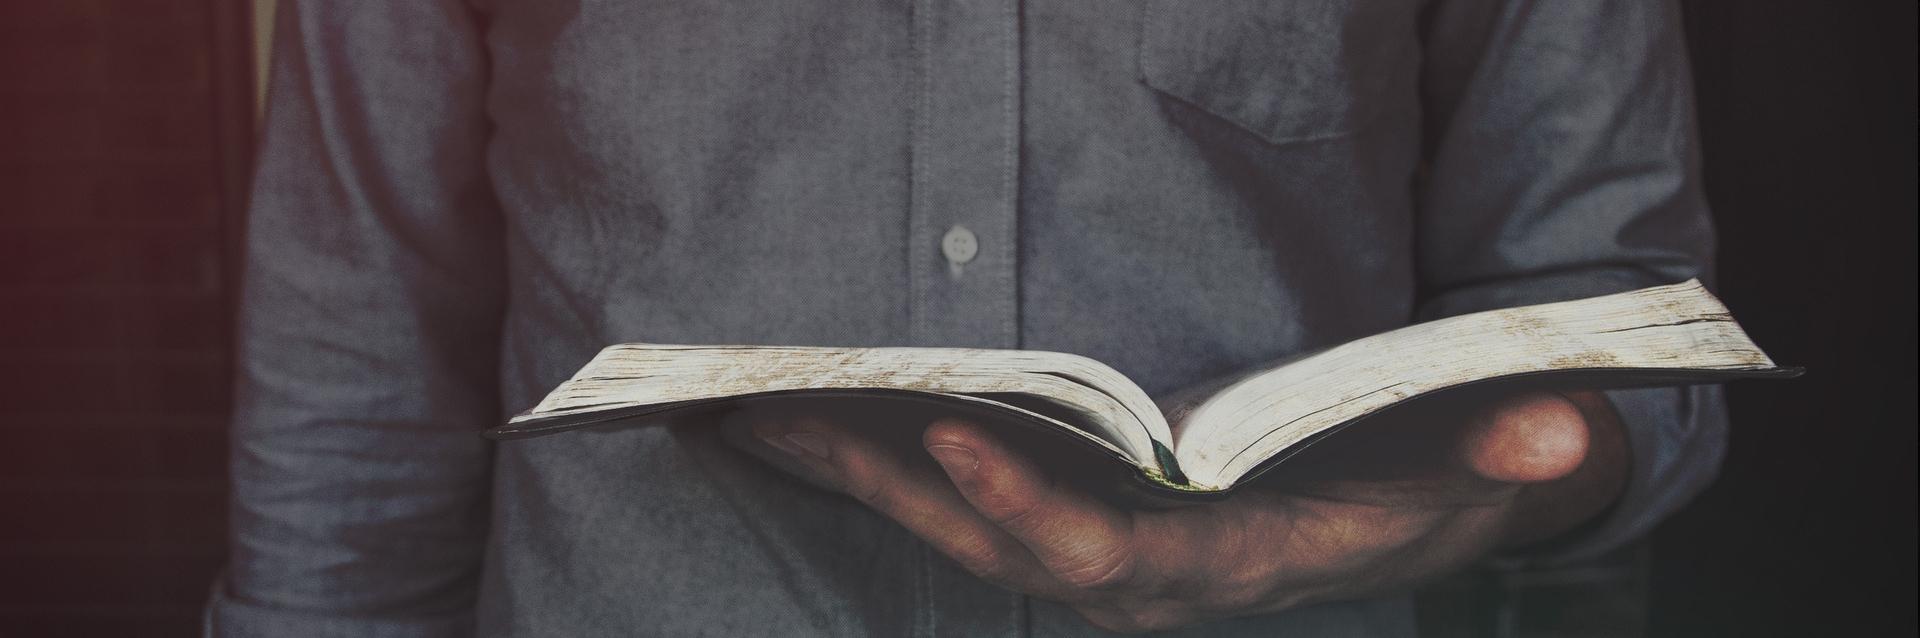 boldly_preach_the_gospel-title-3-Wide 16x9.jpg